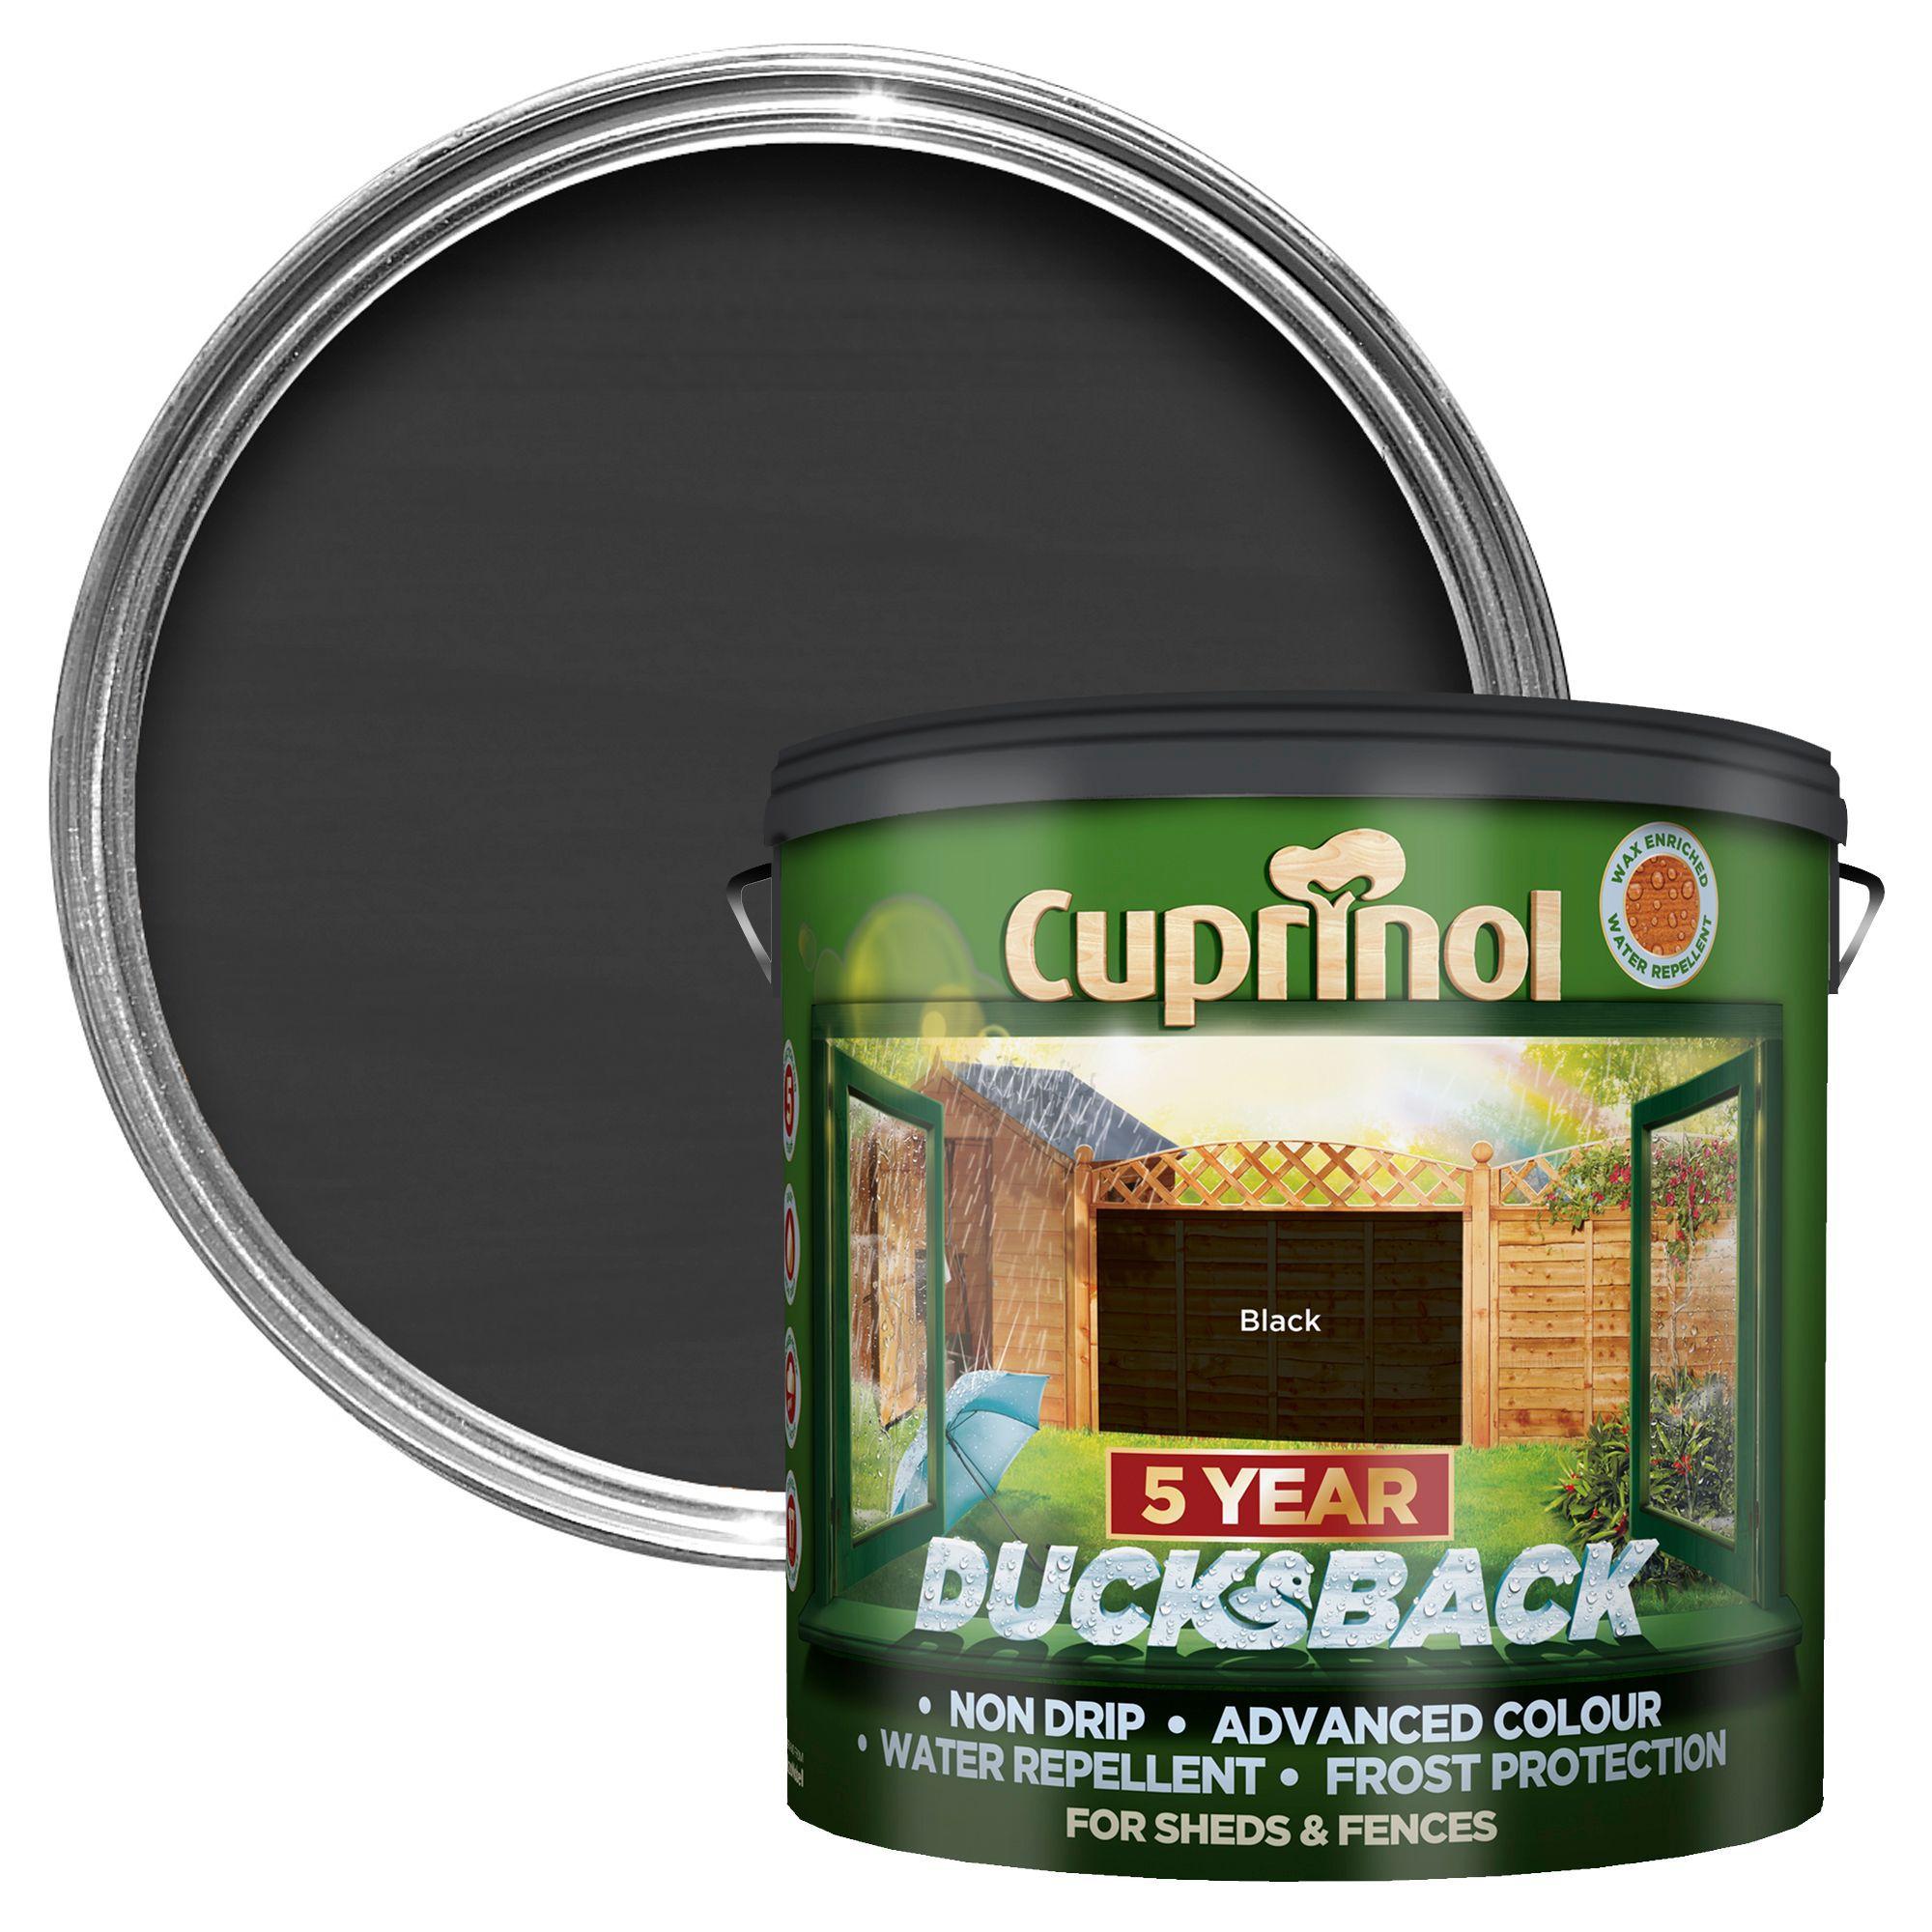 Cuprinol 5 Year Ducksback Black Matt Shed & Fence Treatment 9L |  Departments | DIY at B&Q